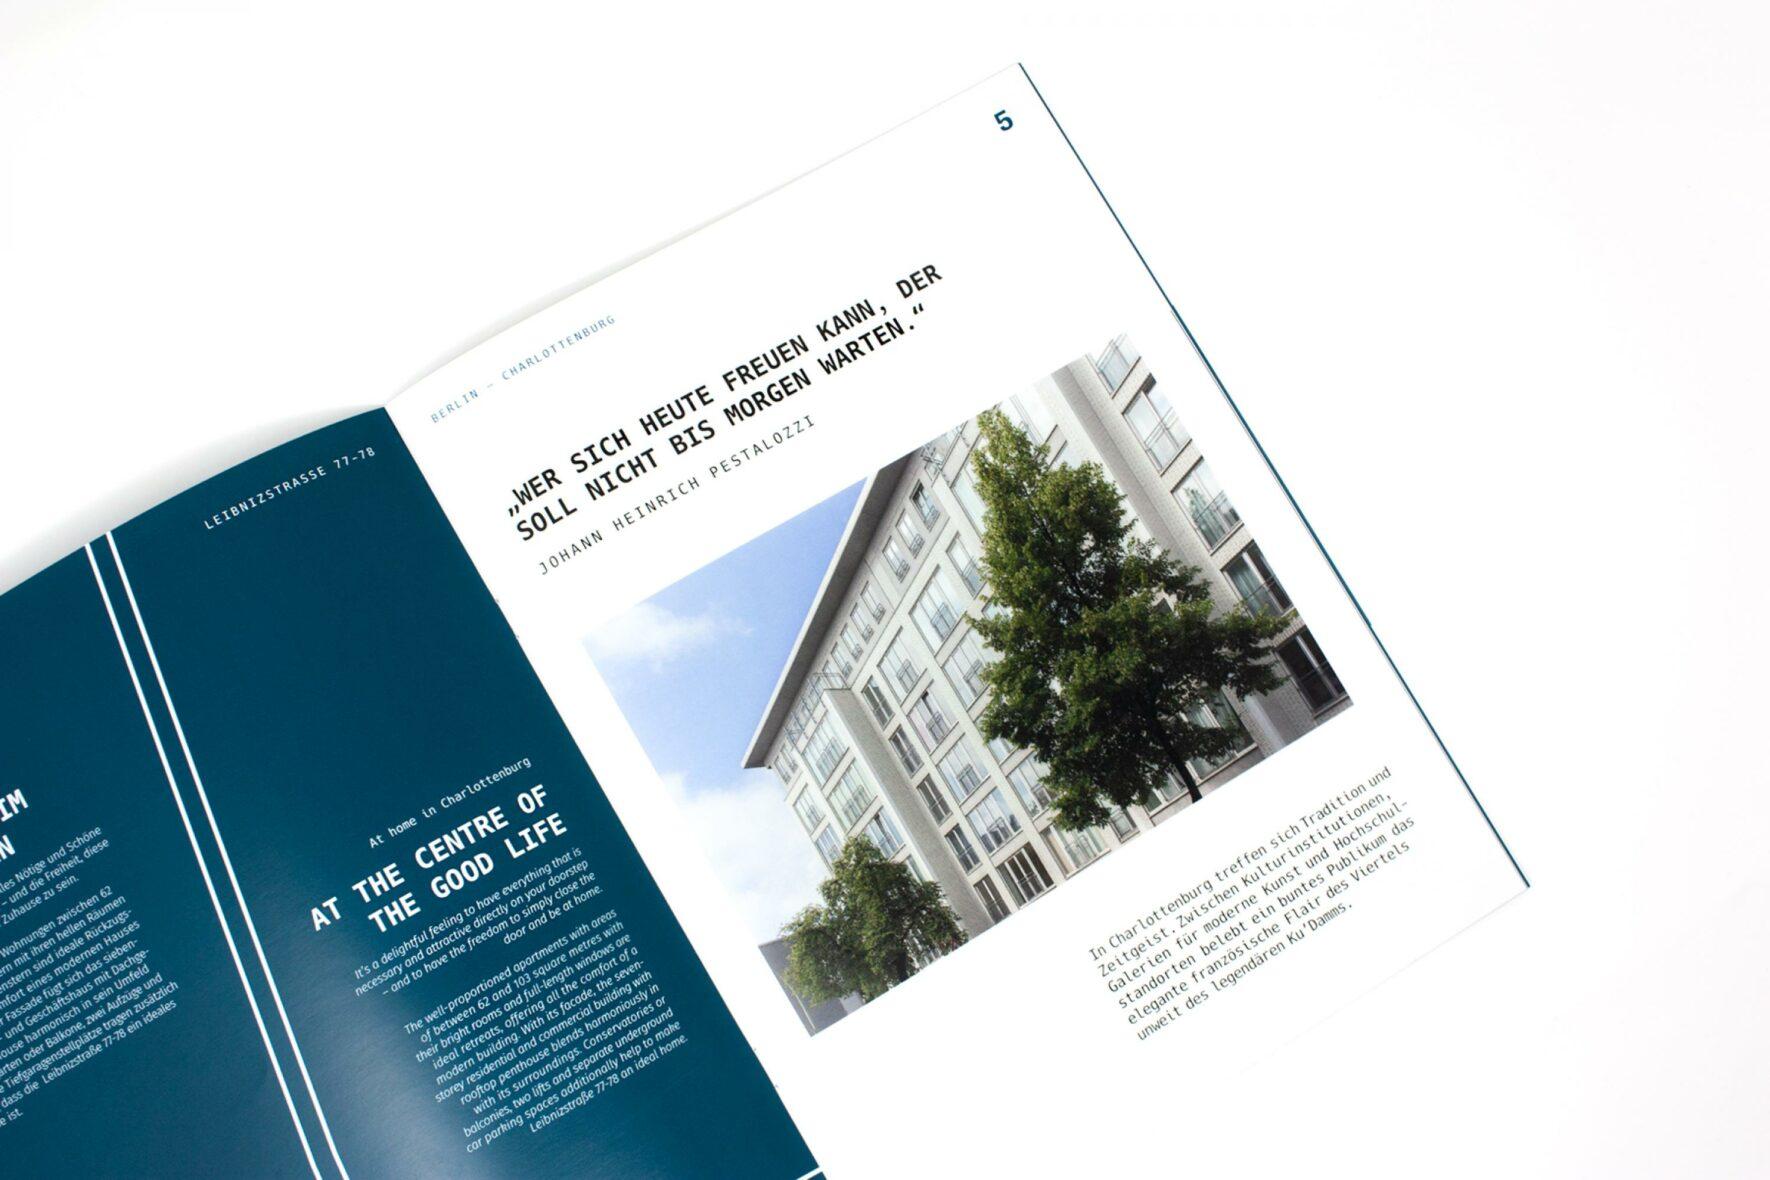 Broschuere-Leibniz-Immobilienbranding-Trendcity-FORMLOS-berlin-Print44